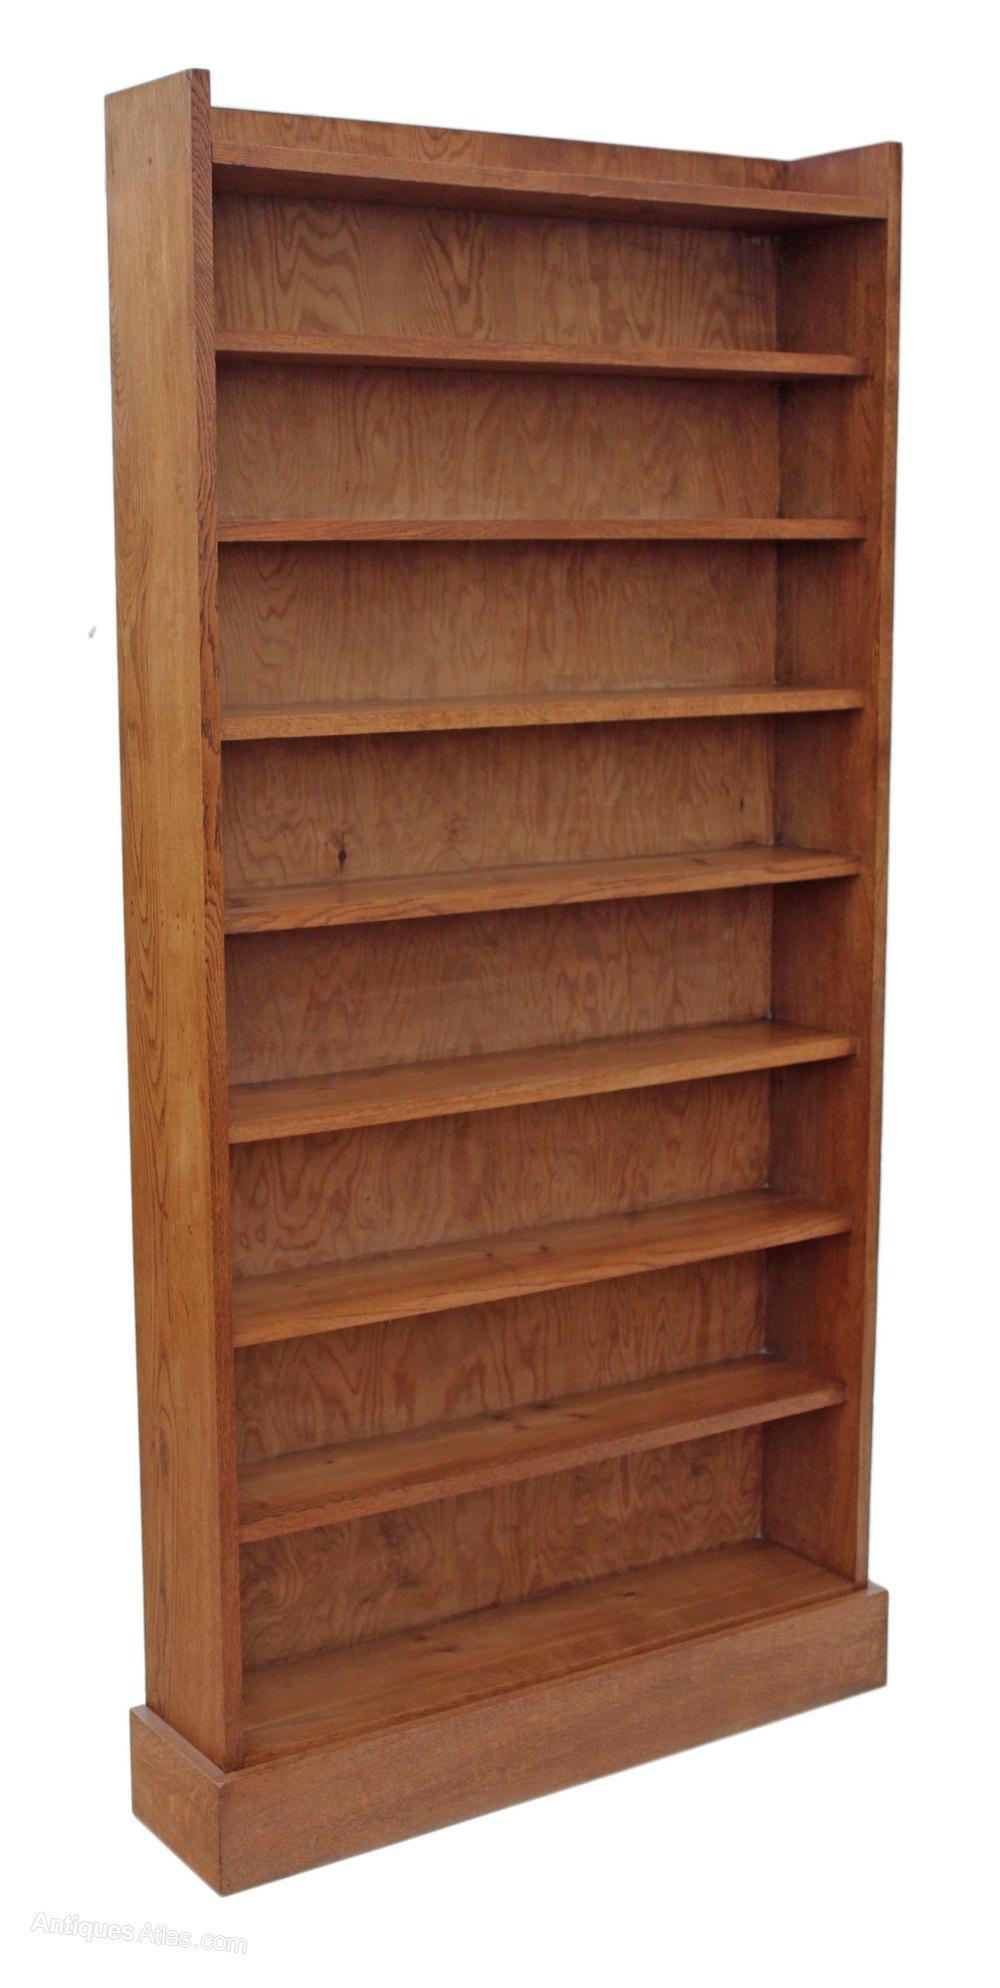 Antiques Atlas - Tall Oak Open Bookcase Shelves Display